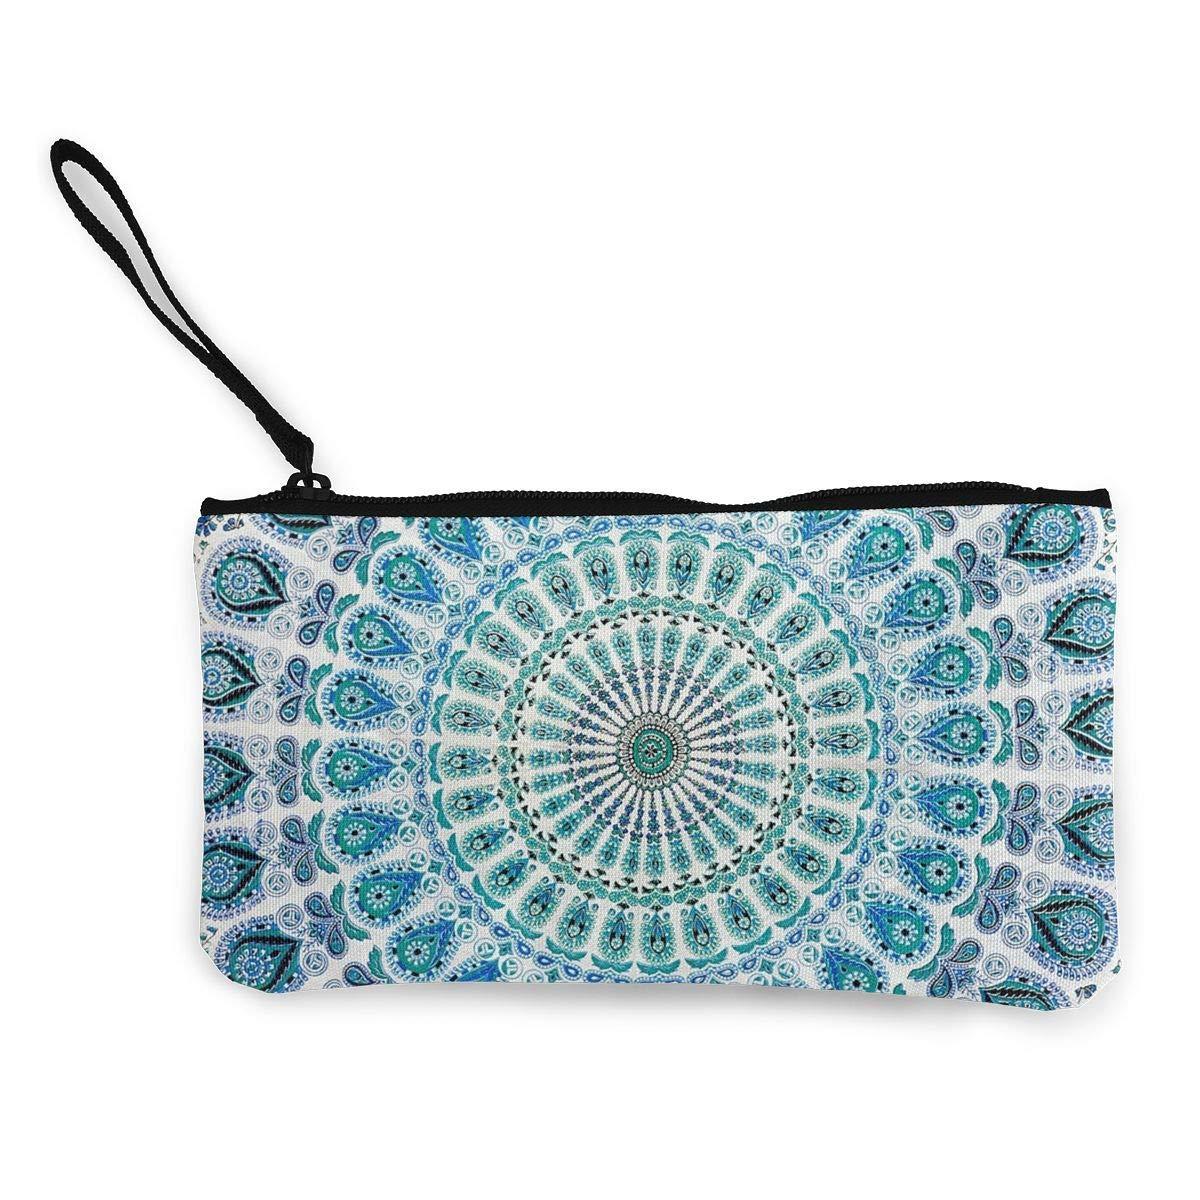 Coin Purse Gallery Mandala Green Womens Zip Canvas Small Purse TravelTrendy Bag